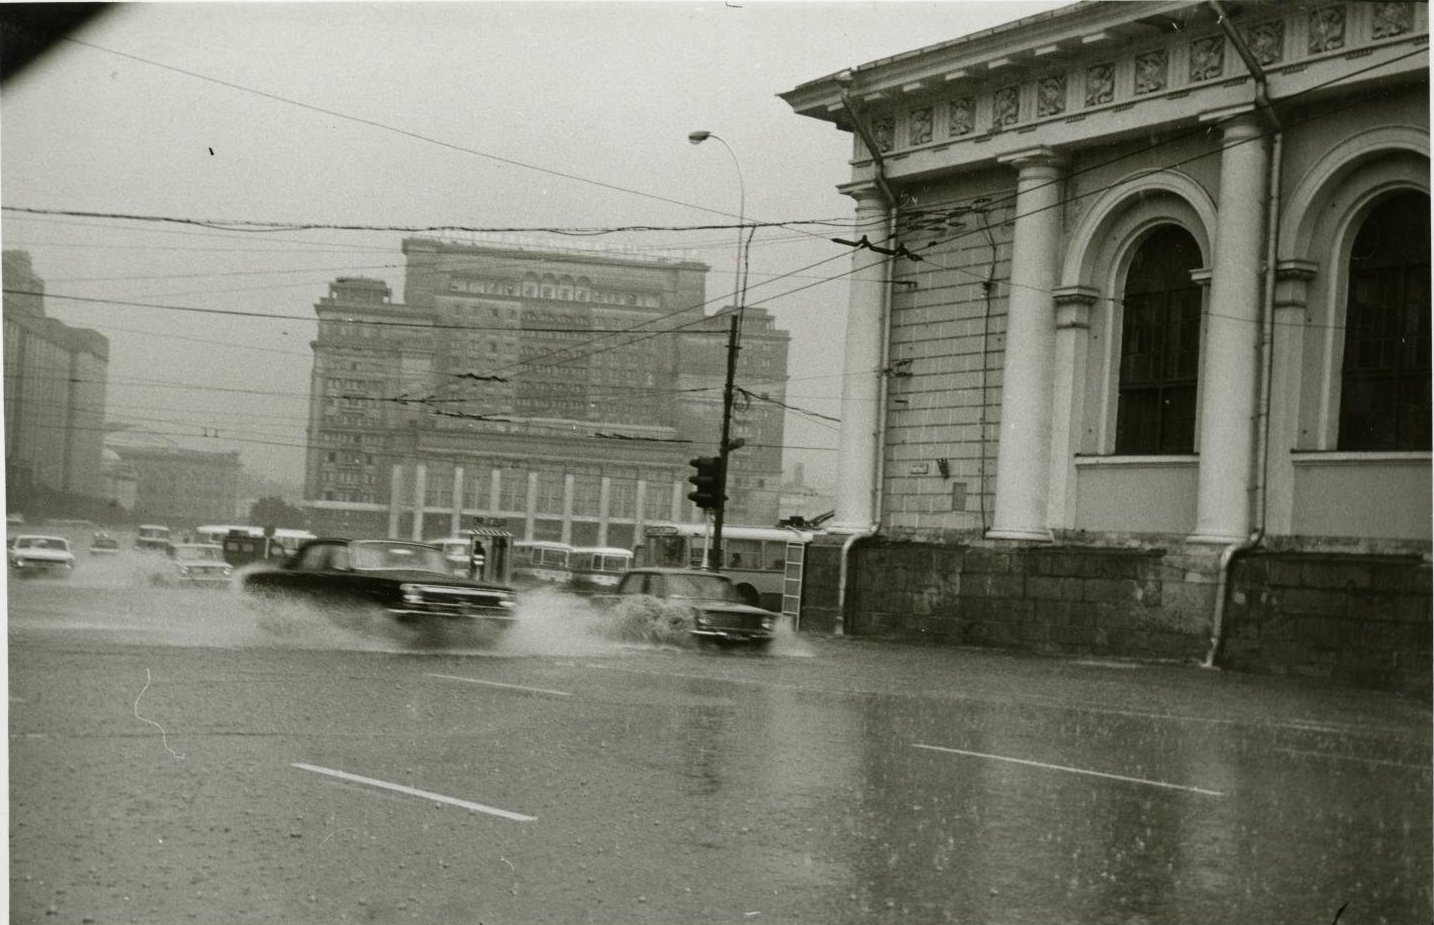 1970-е. Вид на гостиницу «Москва» и движущийся перед ней транспорт во время сильного дождя (3)